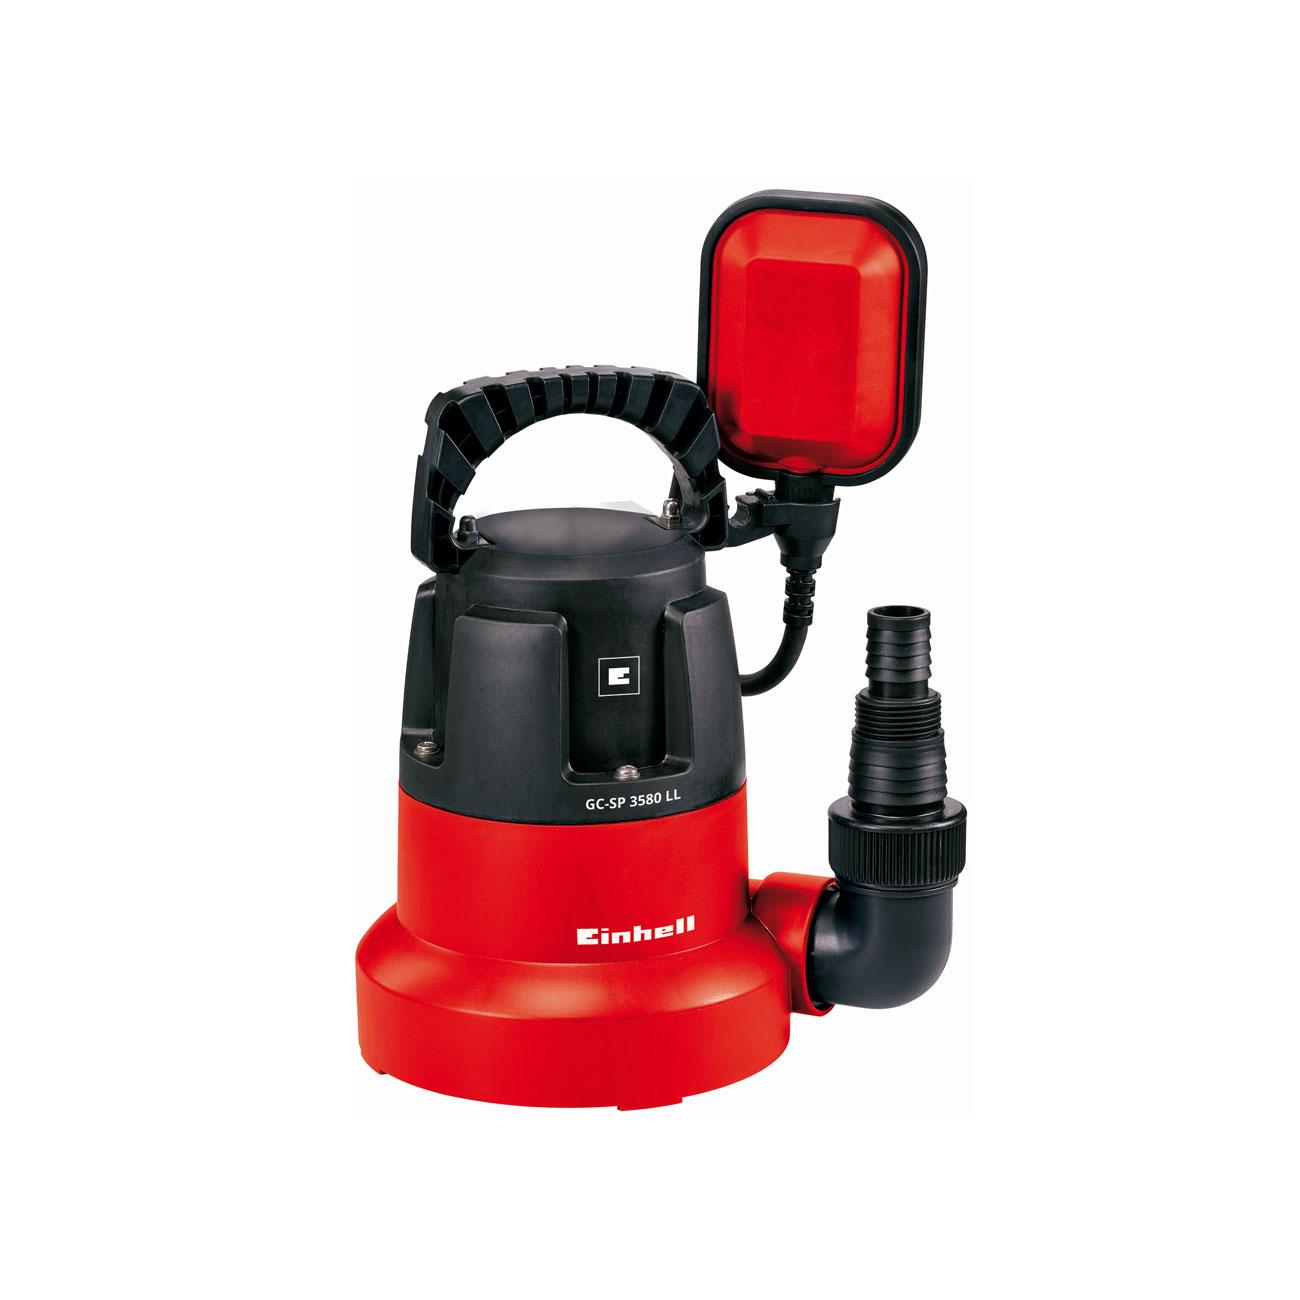 Einhell GC-SP 3580 LL Submersible Pump